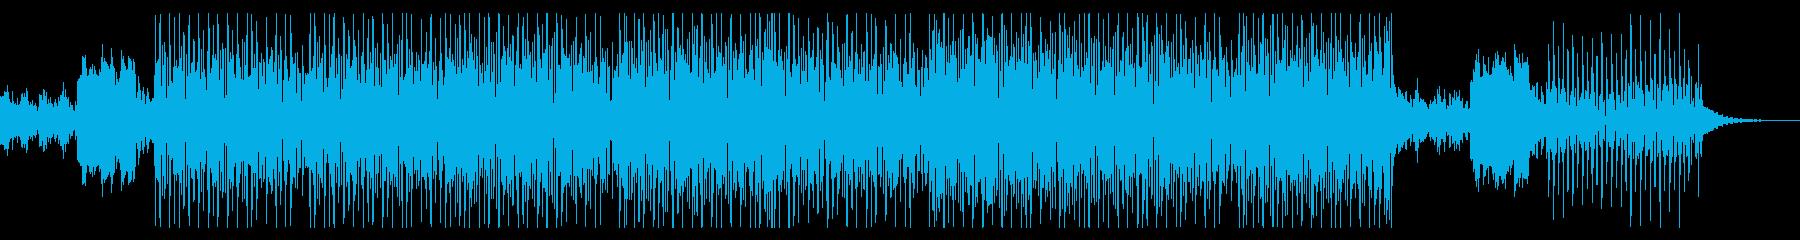 NightFlyの再生済みの波形